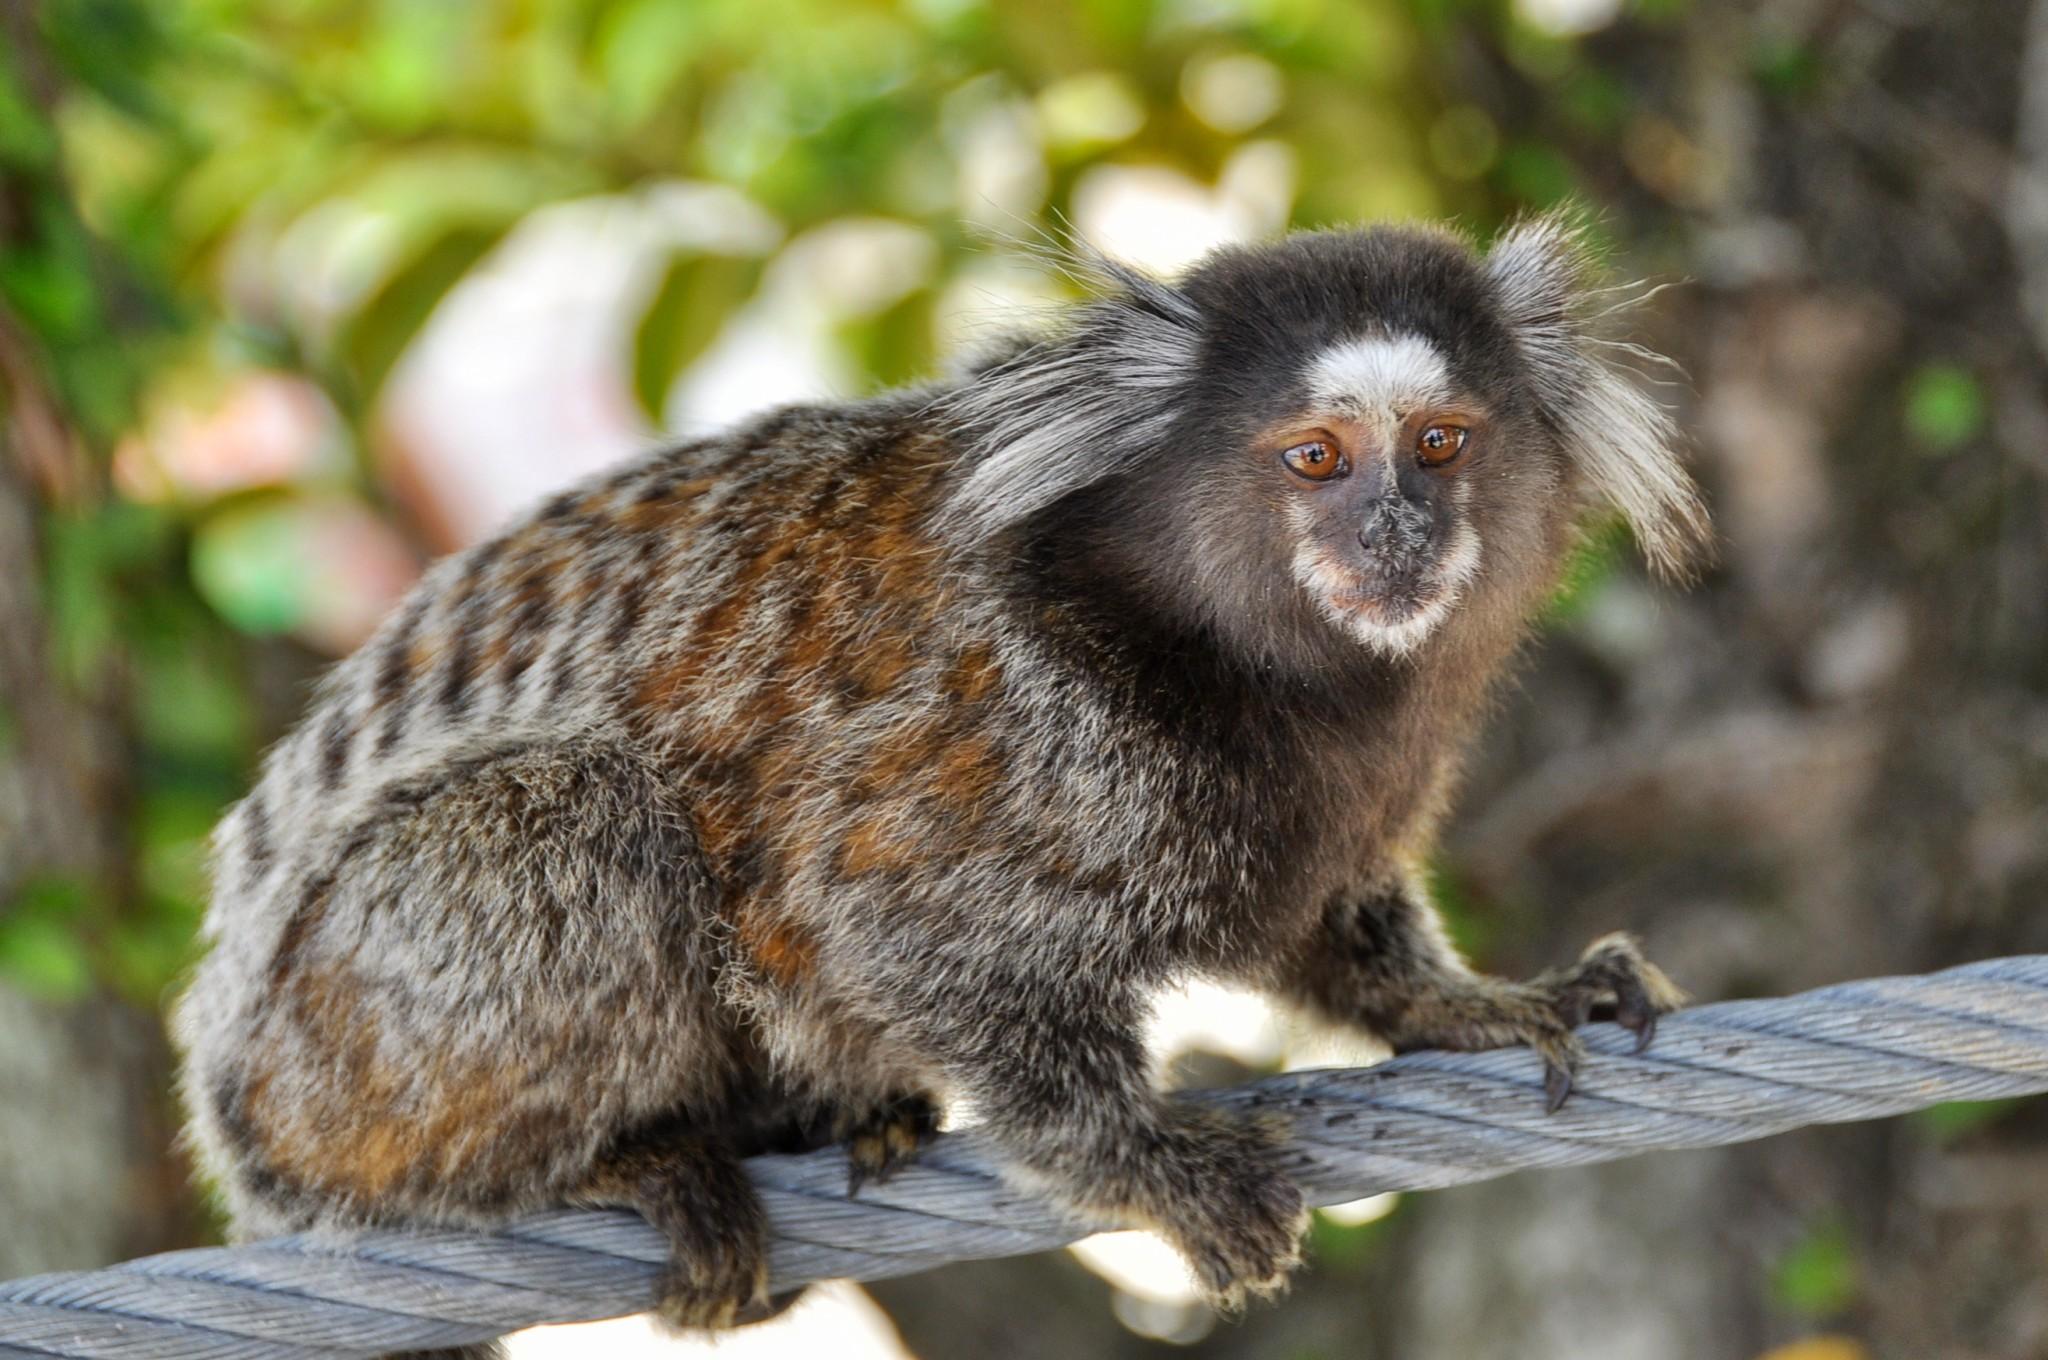 Marmoset monkey at the Sugarloaf Mountain